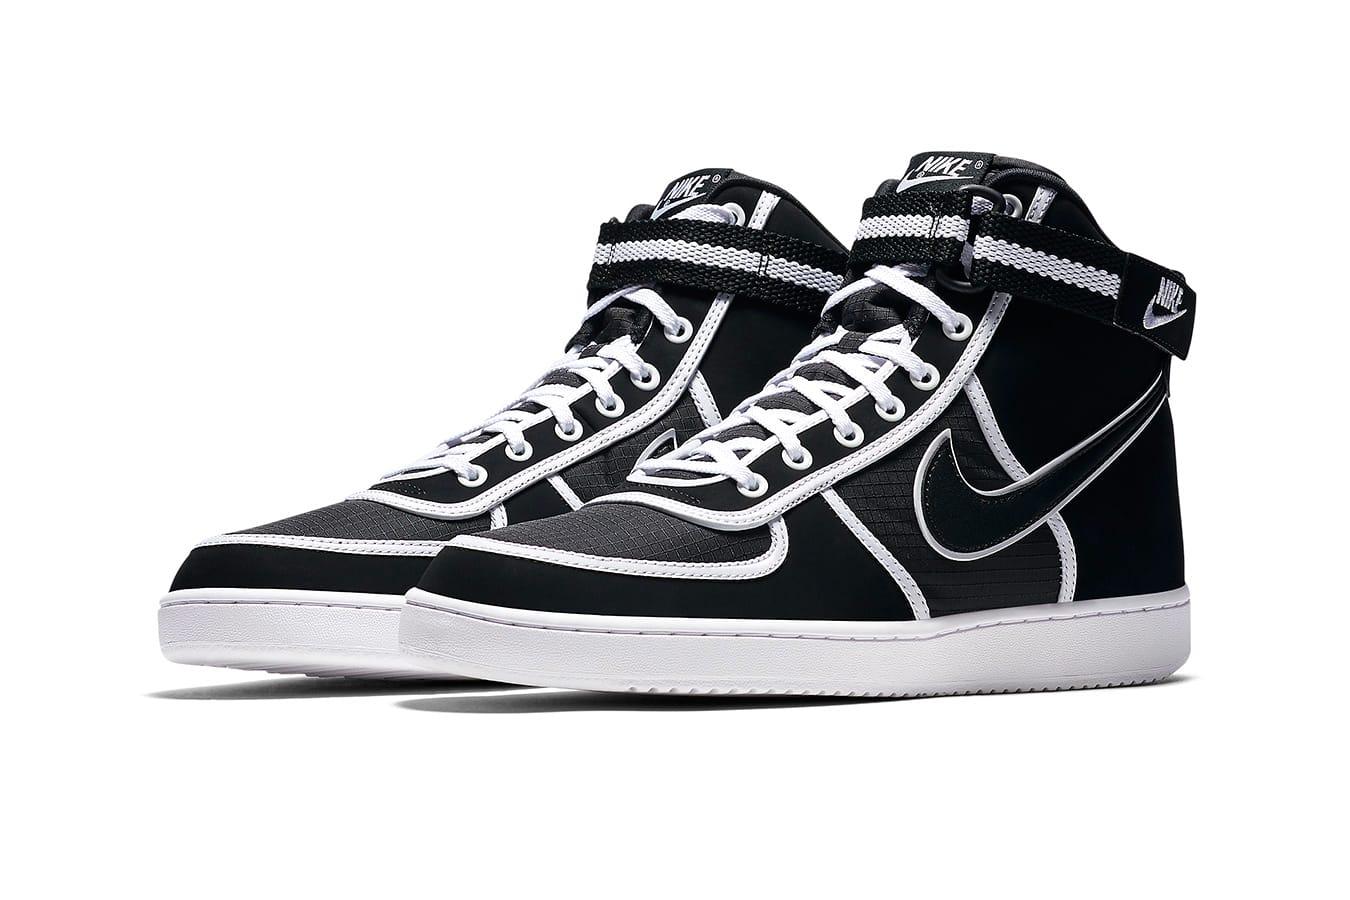 Nike Vandal High Black/White   HYPEBEAST